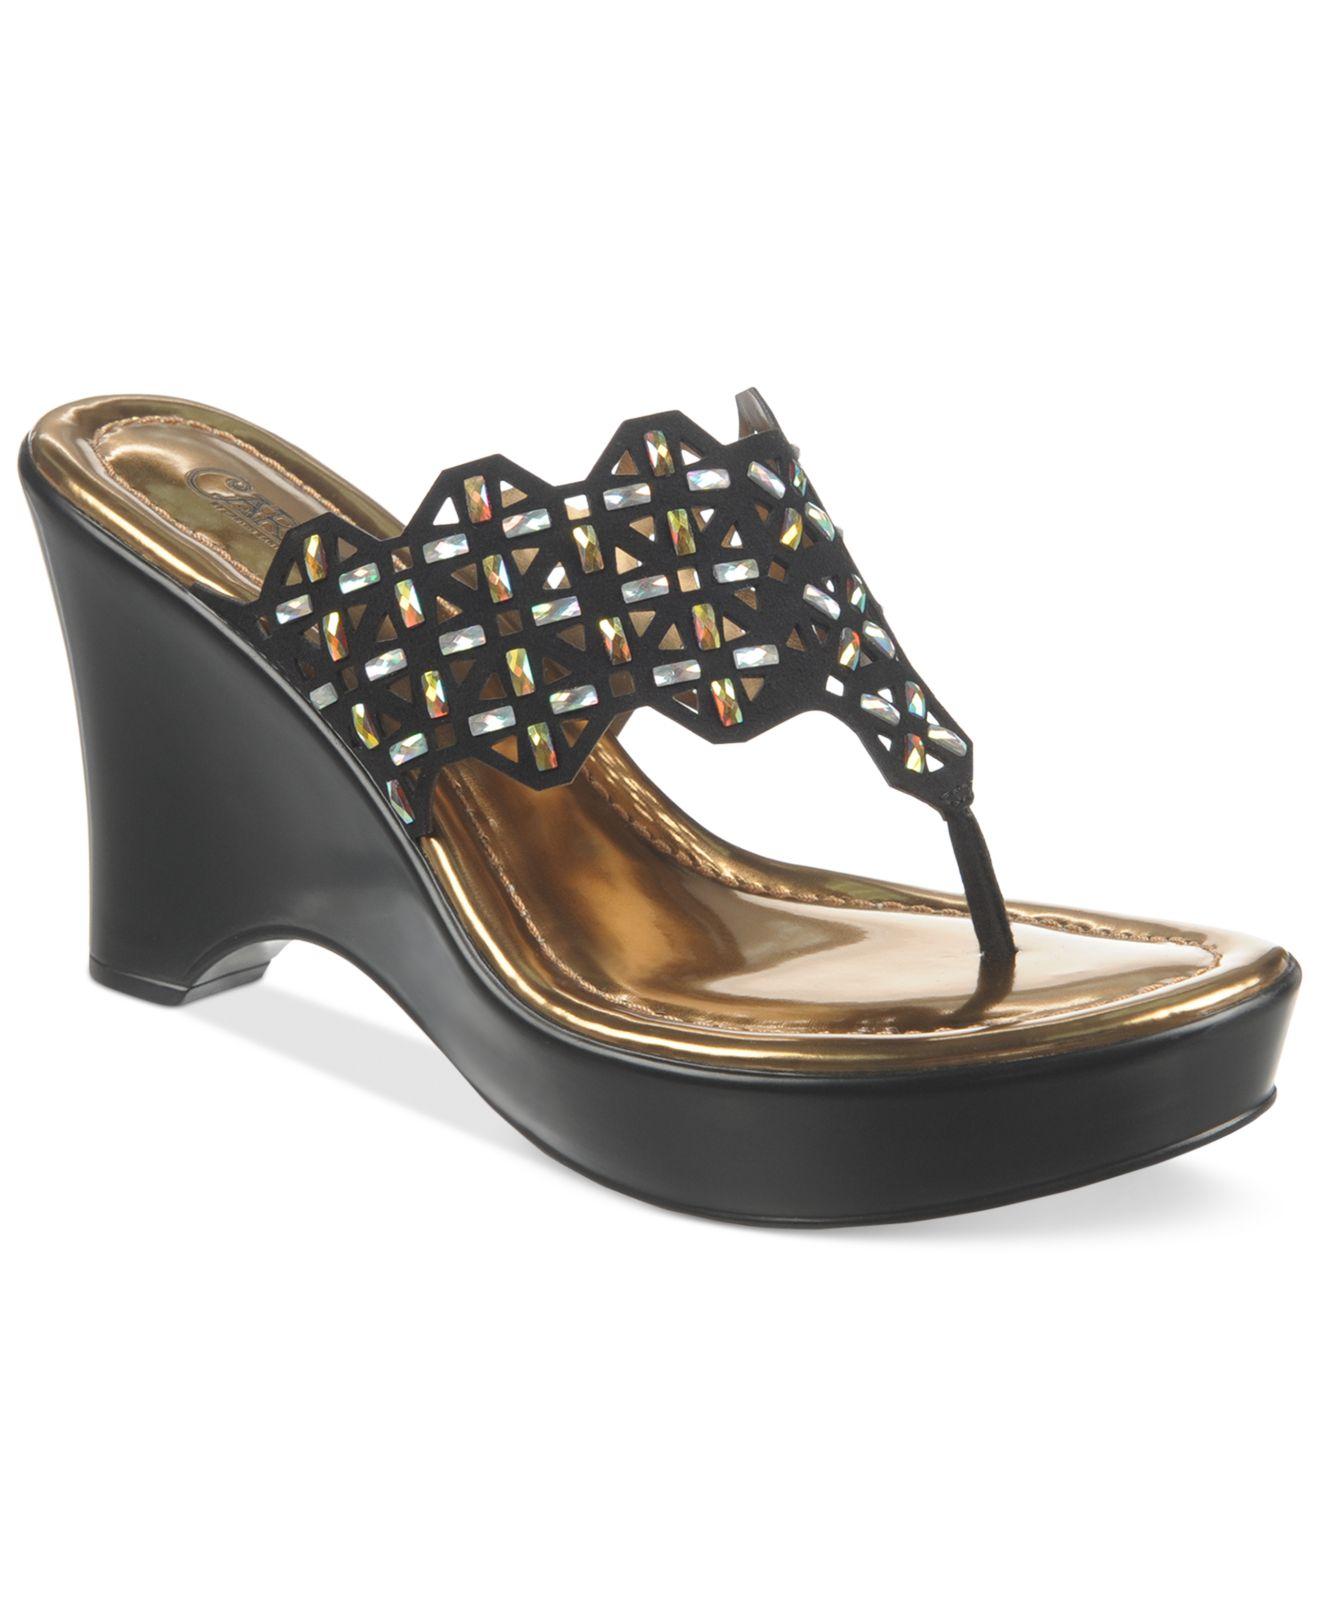 0b8948f35db Lyst - Carlos By Carlos Santana Kaffir Platform Thong Sandals in Black